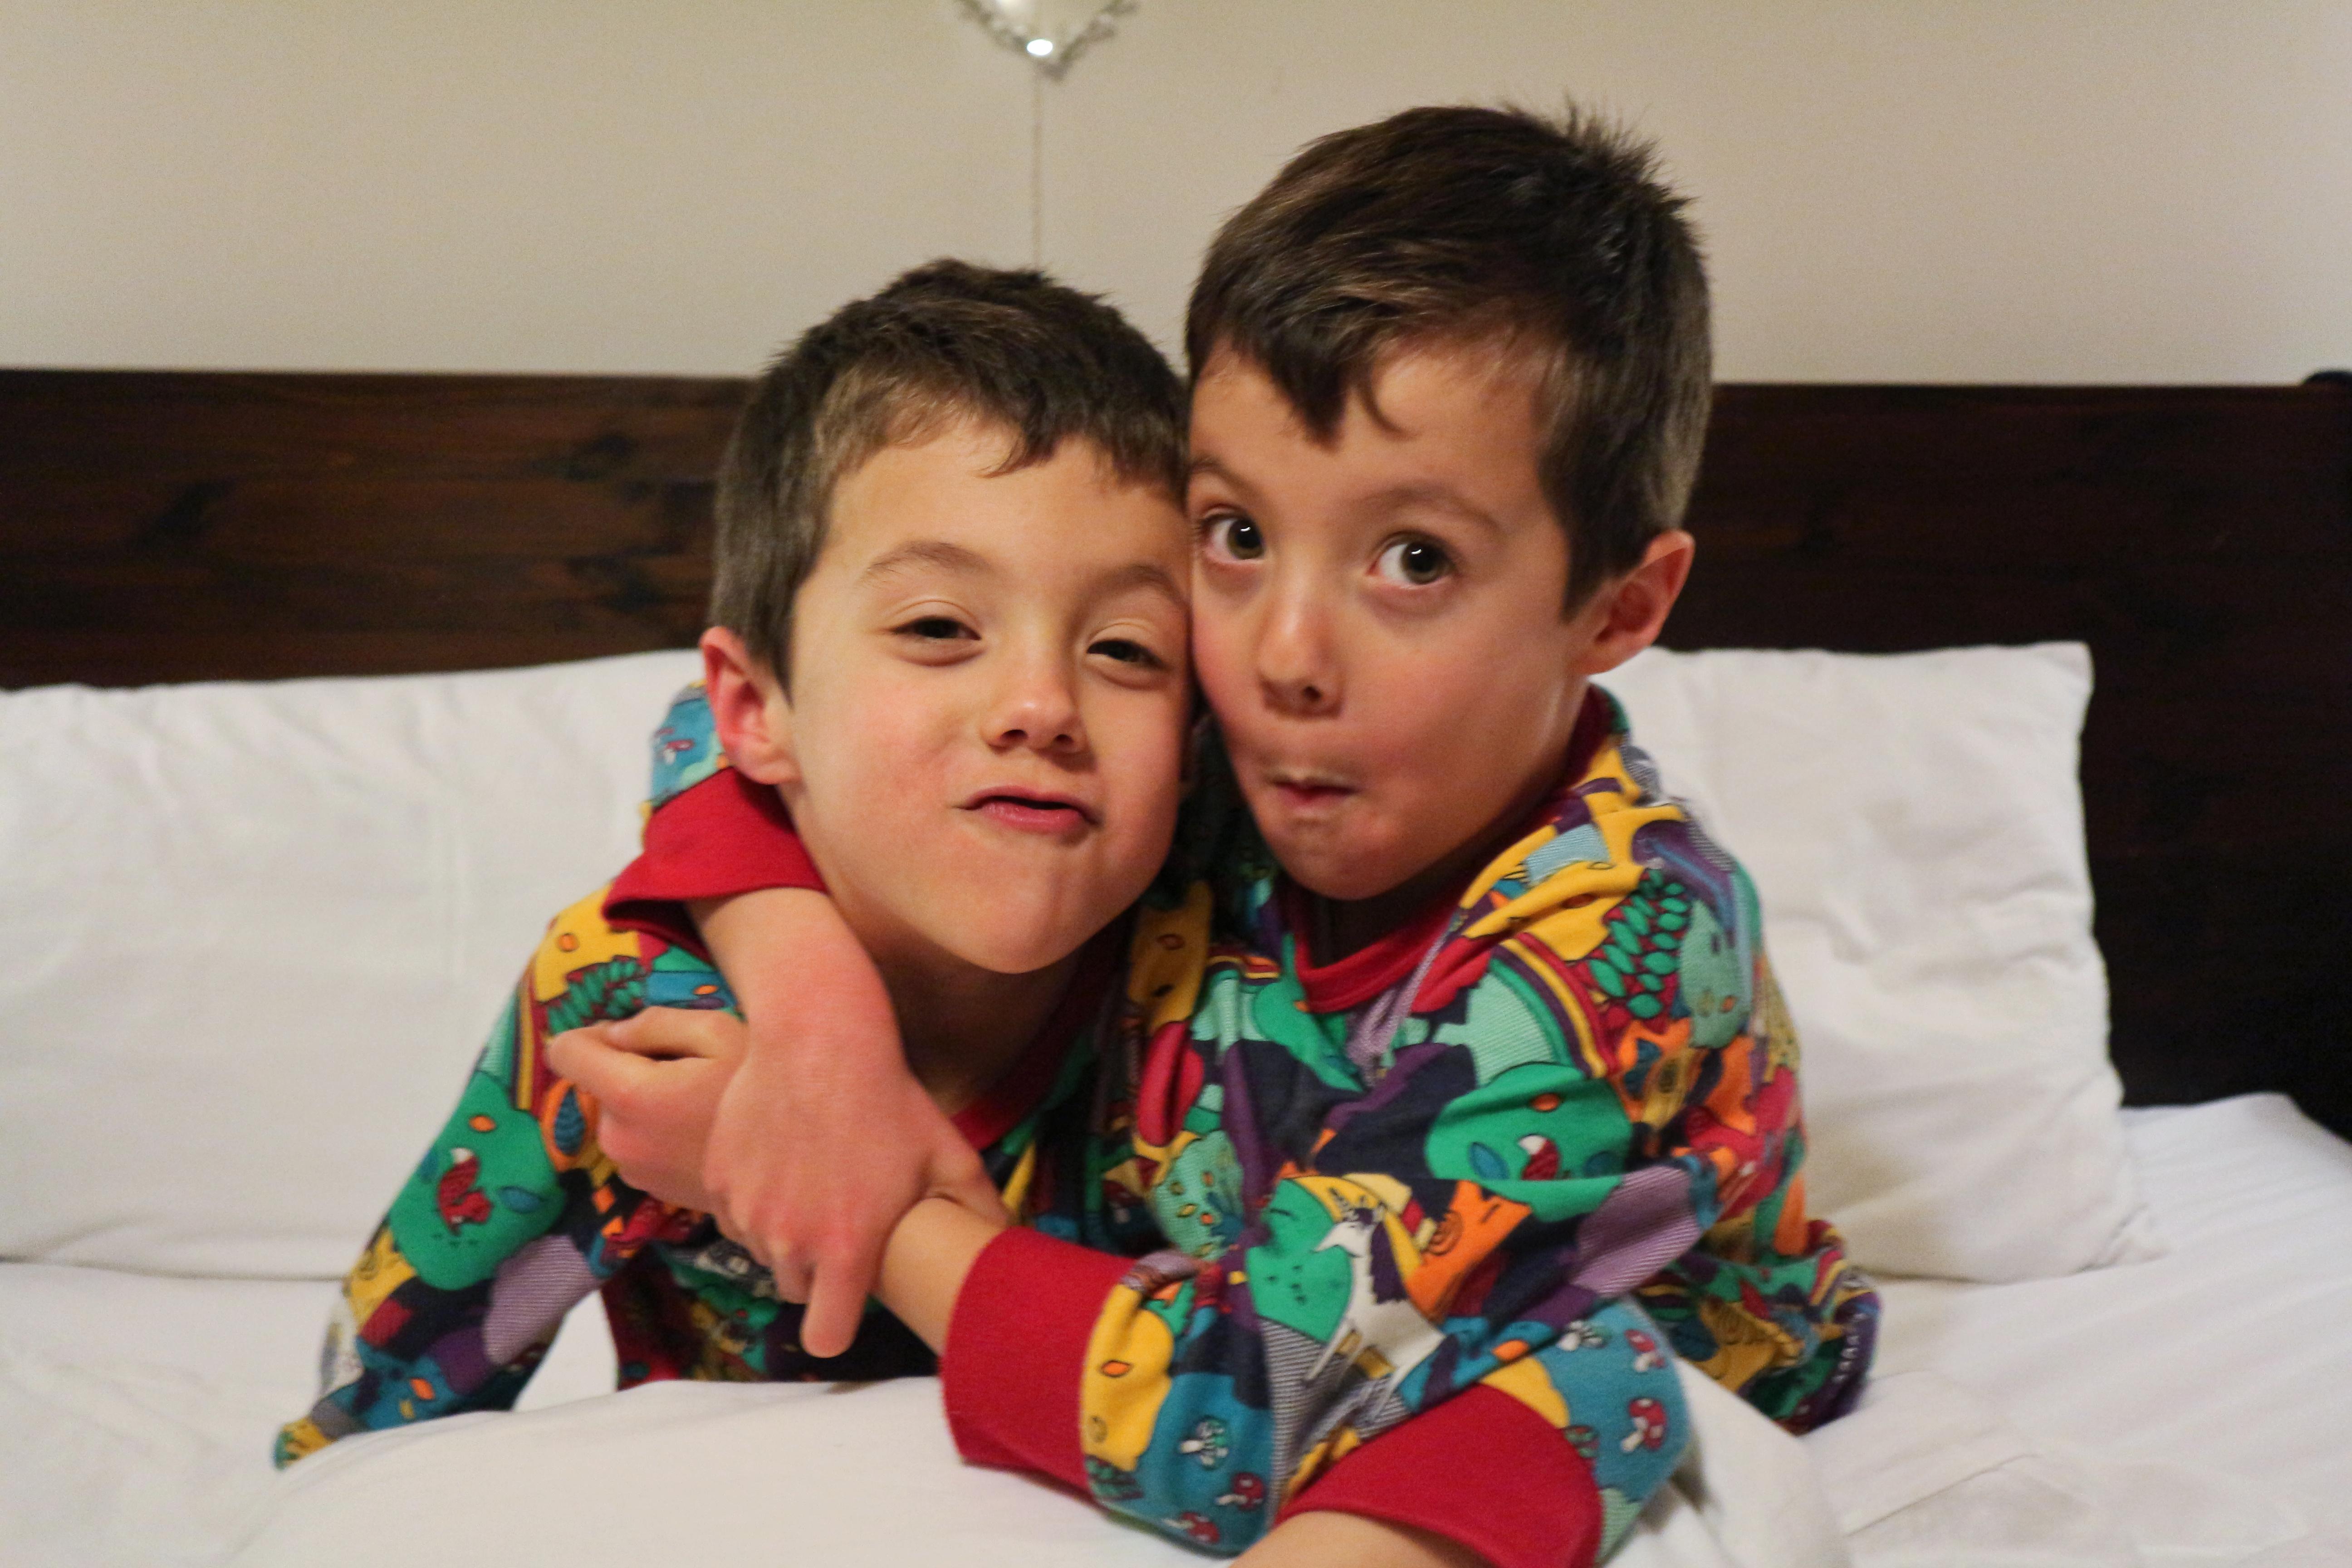 Siblings Project Feb 18